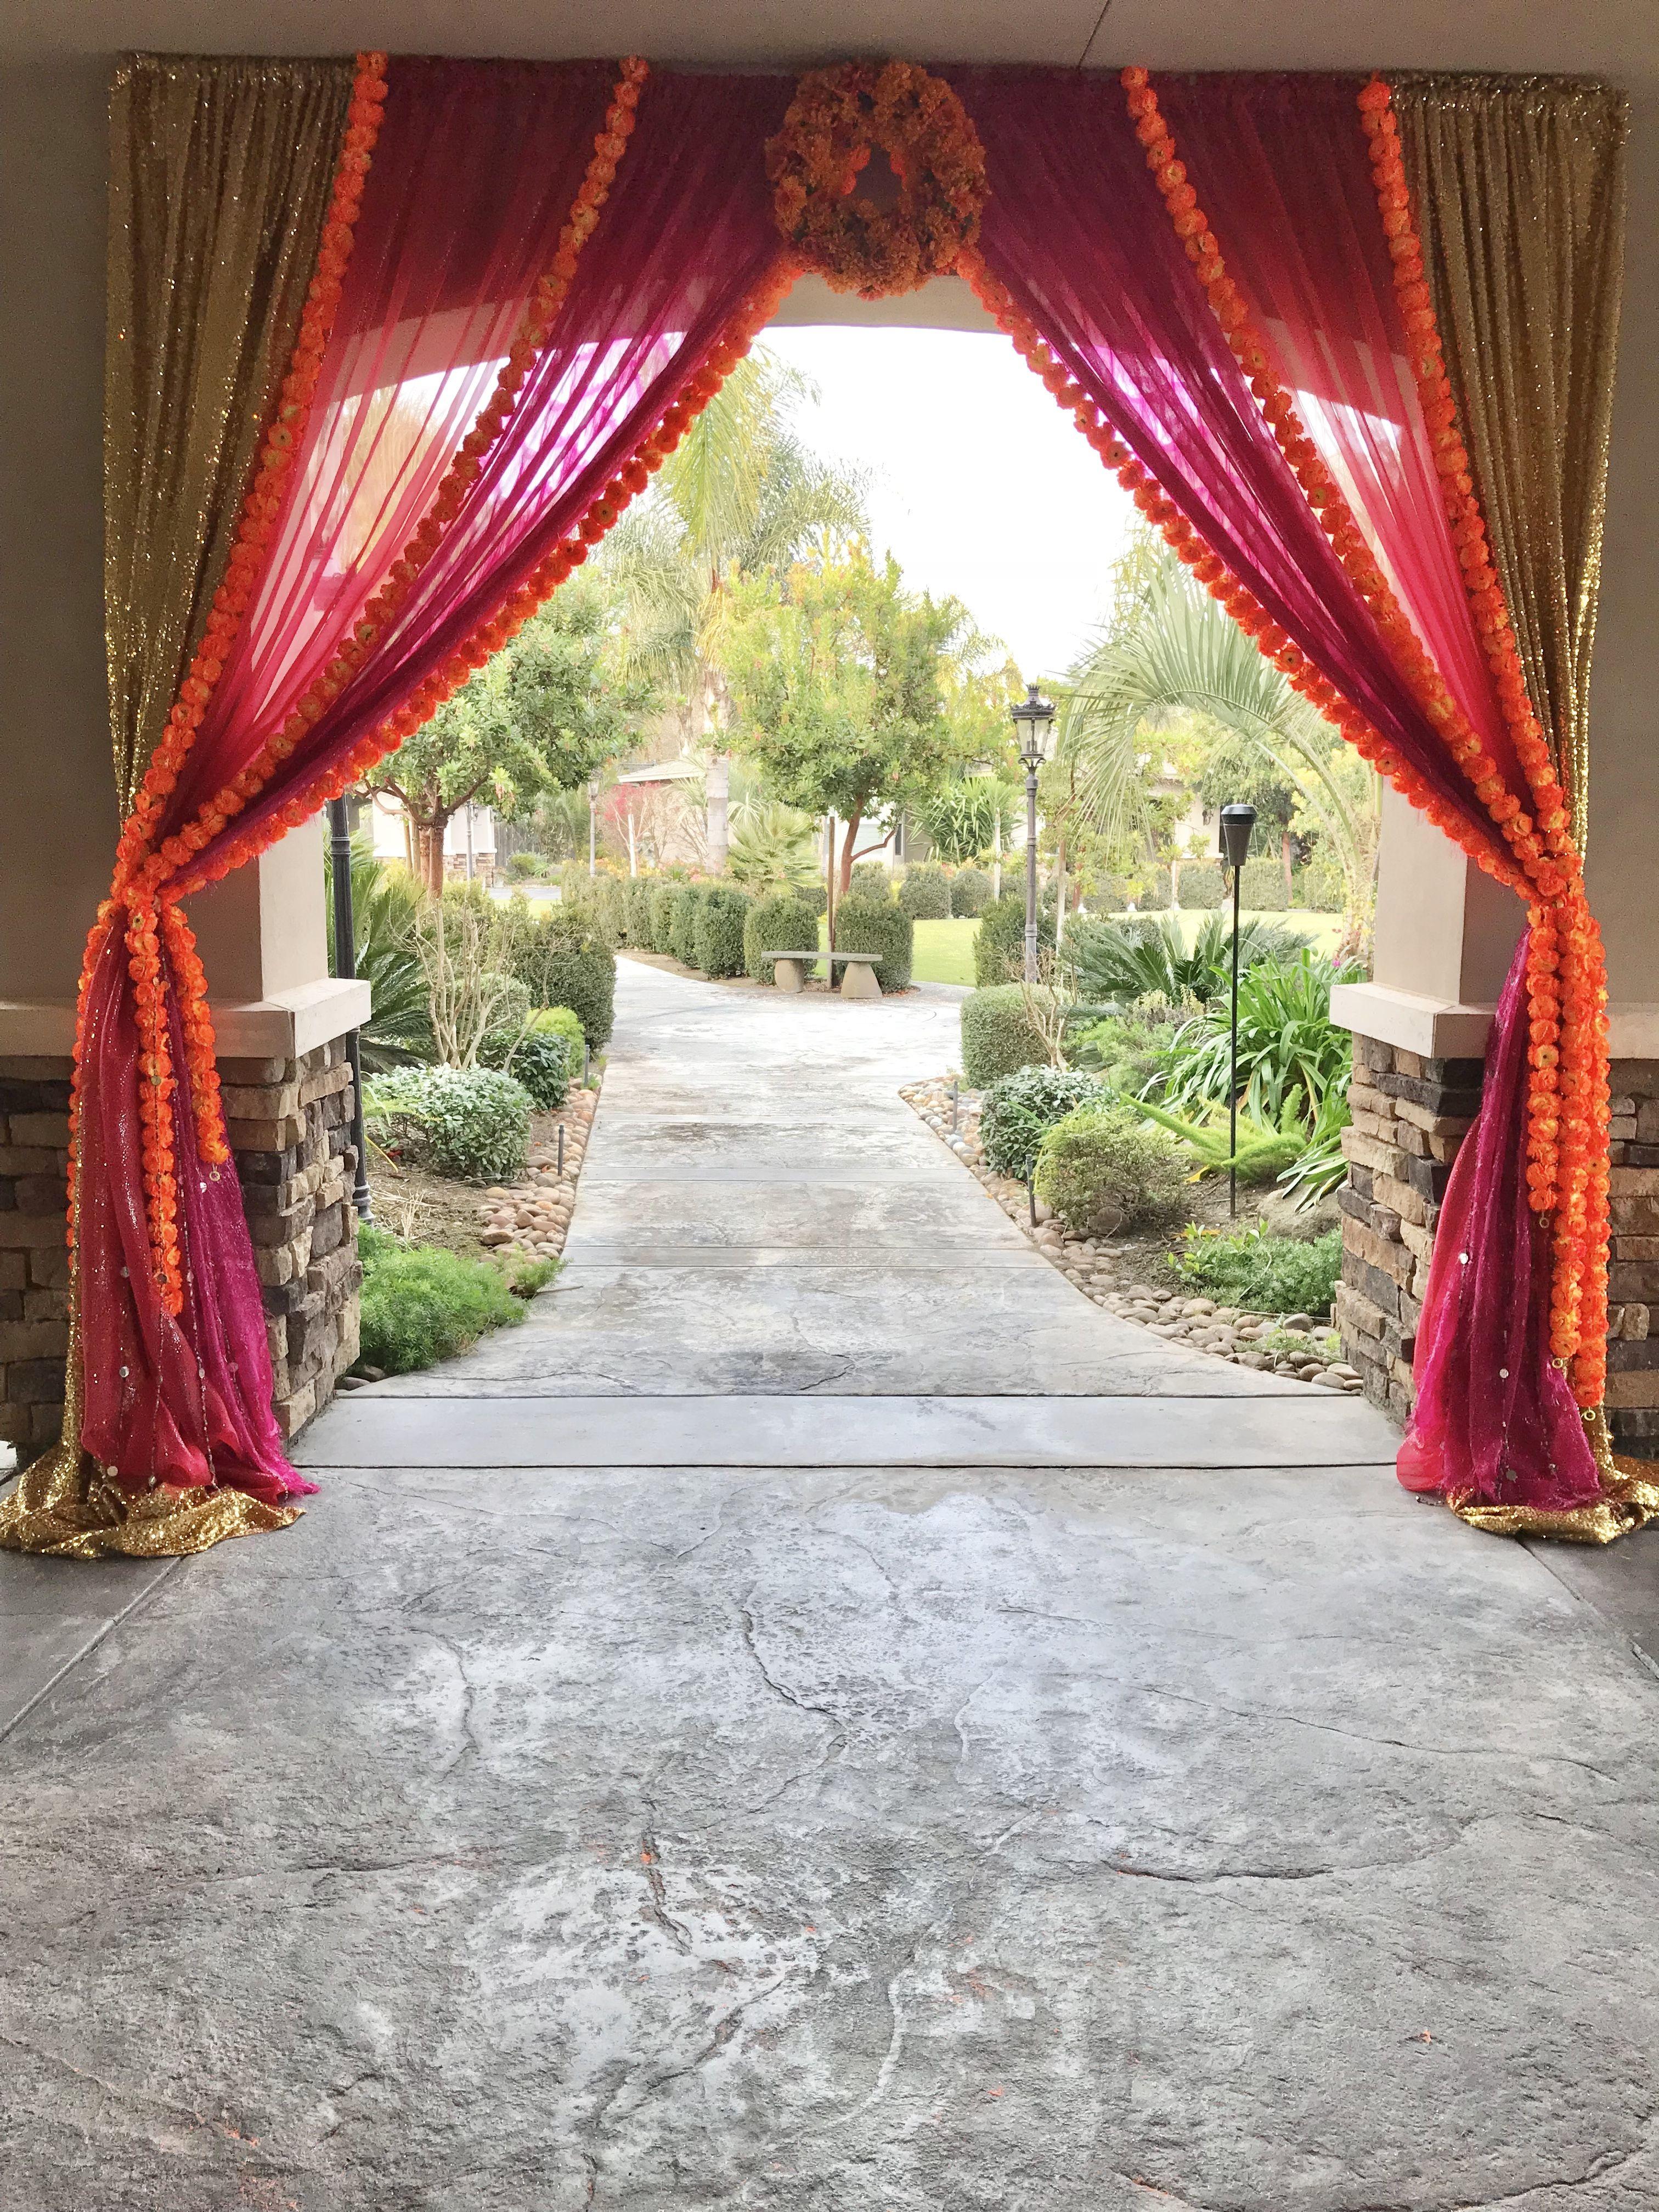 Punjabi Wedding House Decor Colorful Backyard Draping Anaisevents Anaisevents Com Home Wedding Wedding Punjabi Wedding